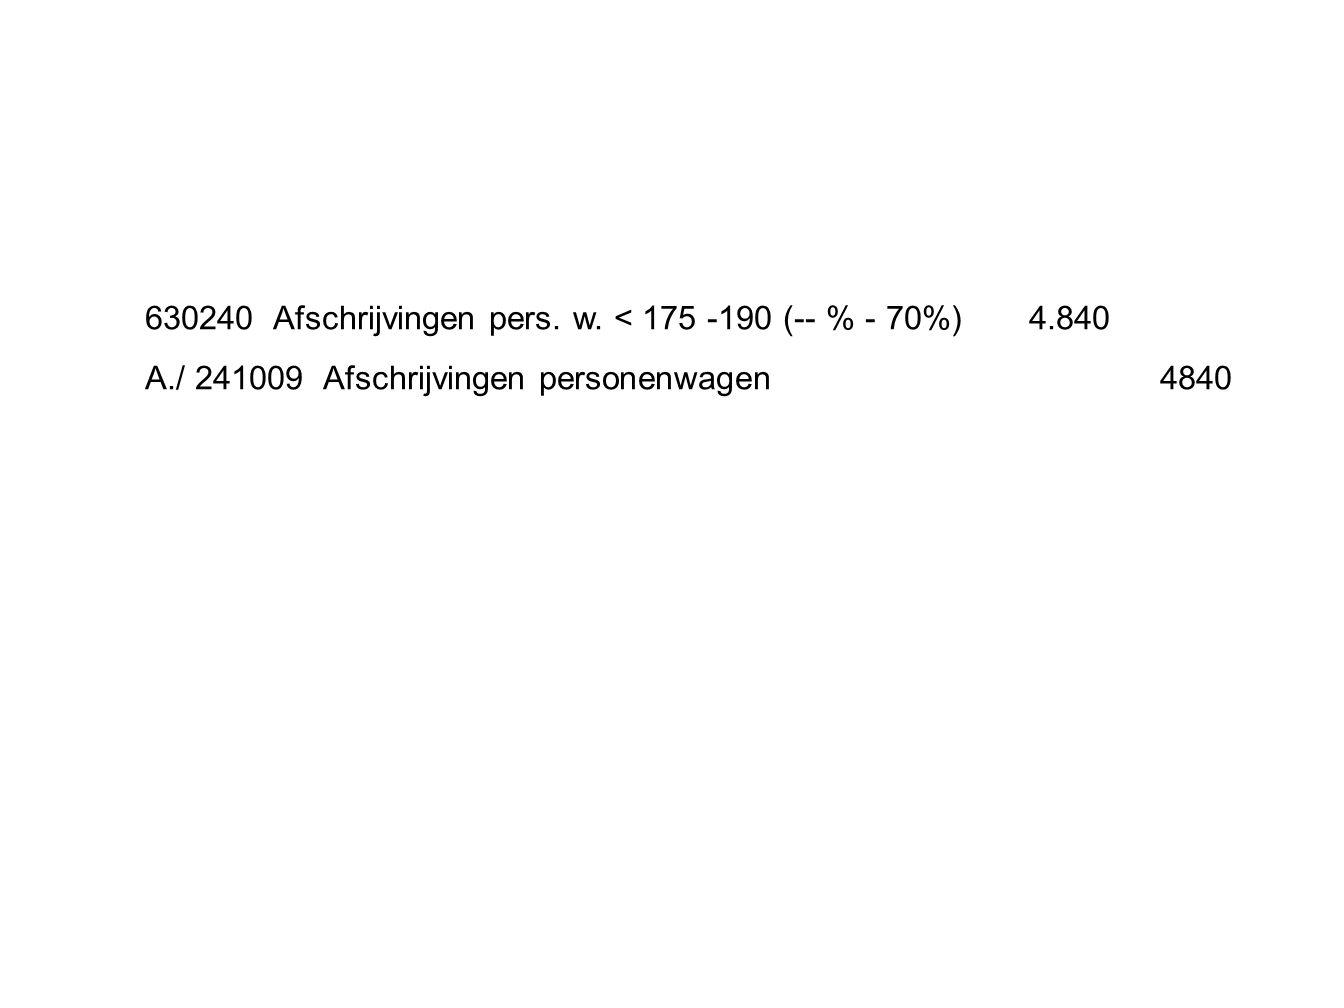 630240 Afschrijvingen pers. w. < 175 -190 (-- % - 70%) 4.840 A./ 241009 Afschrijvingen personenwagen 4840